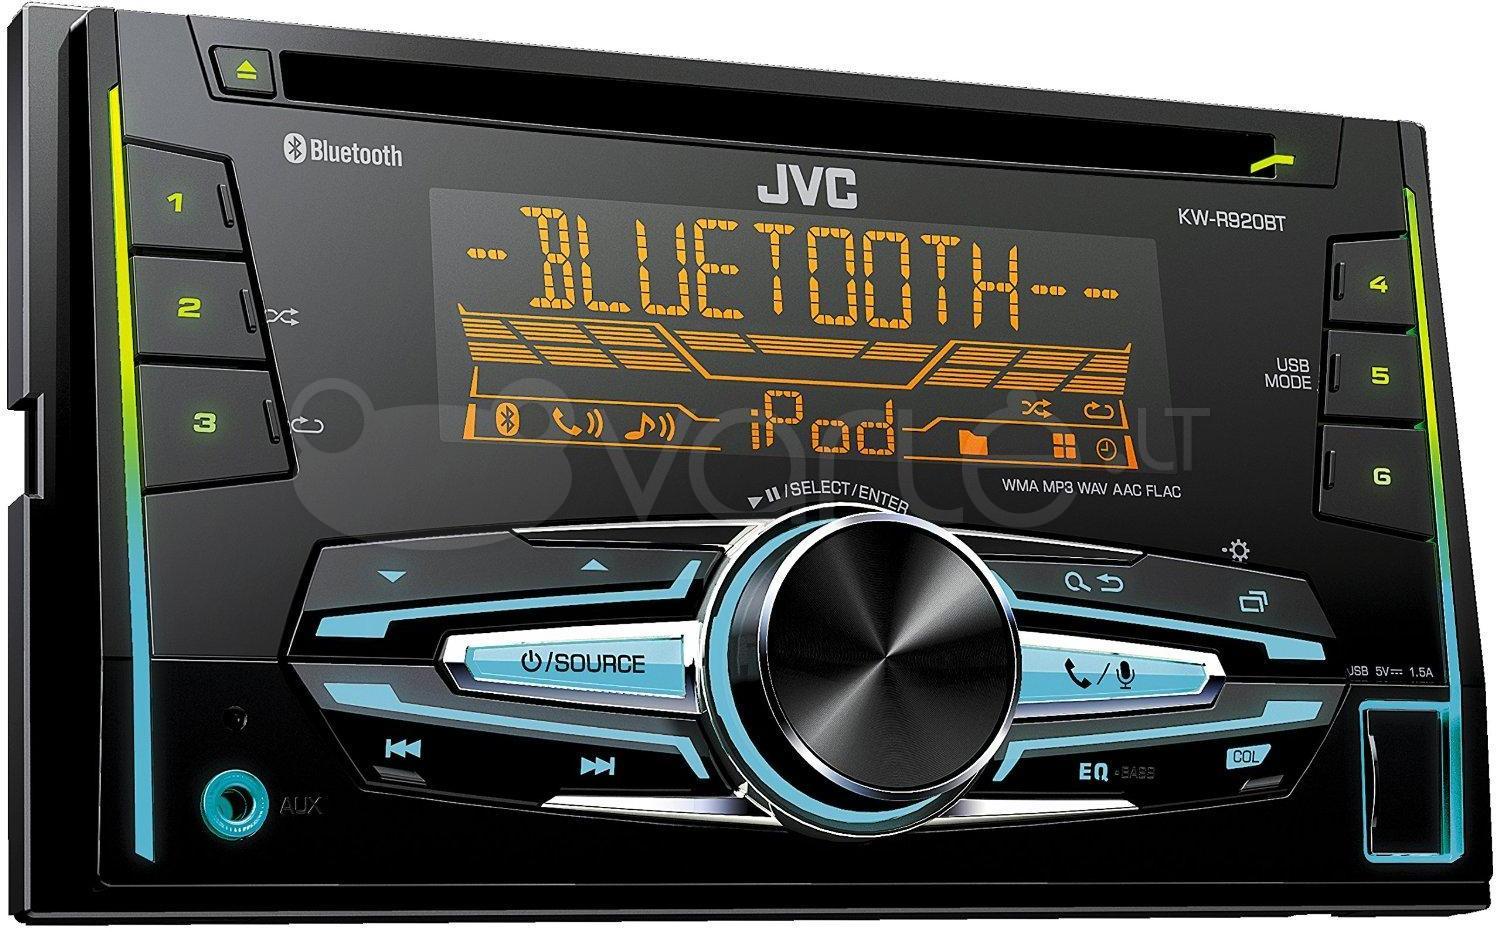 automagnetola jvc kw r920bt bluetooth double din stereo. Black Bedroom Furniture Sets. Home Design Ideas